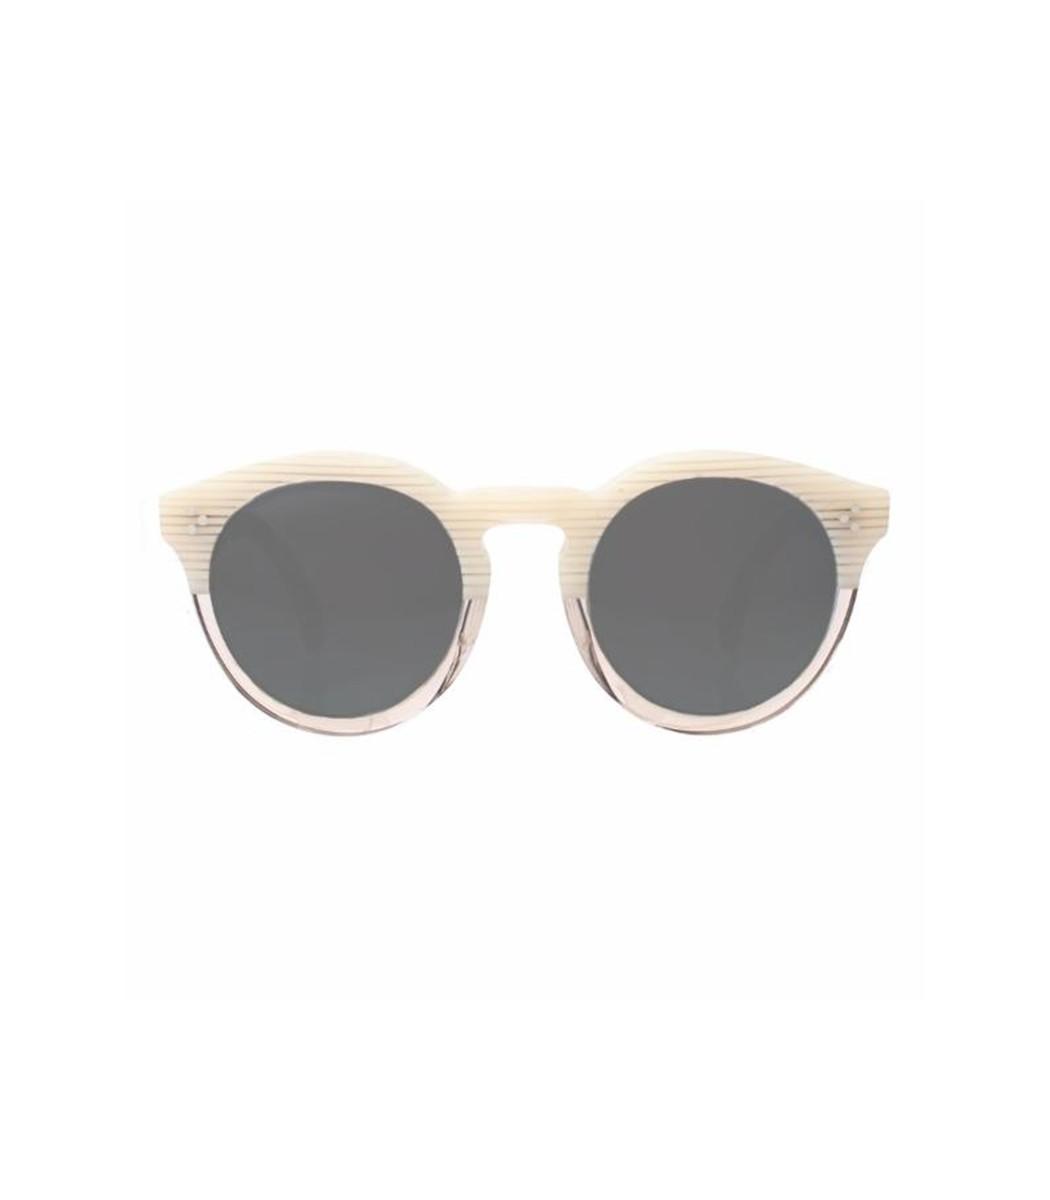 Leonard II Sunglasses in Cream Stripes